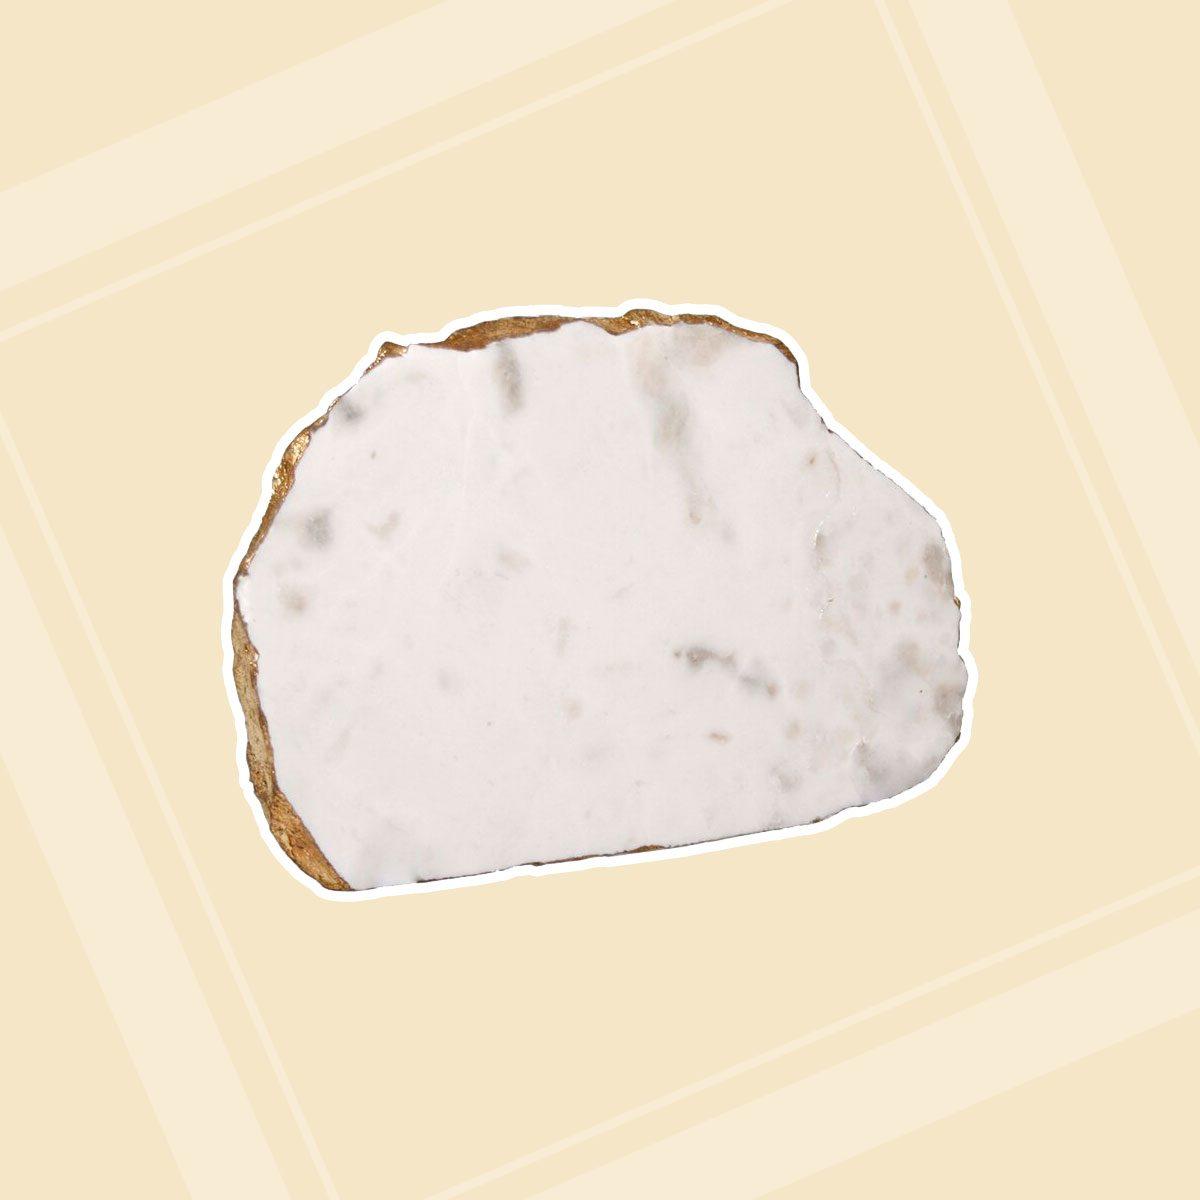 Irregular Marble Platter